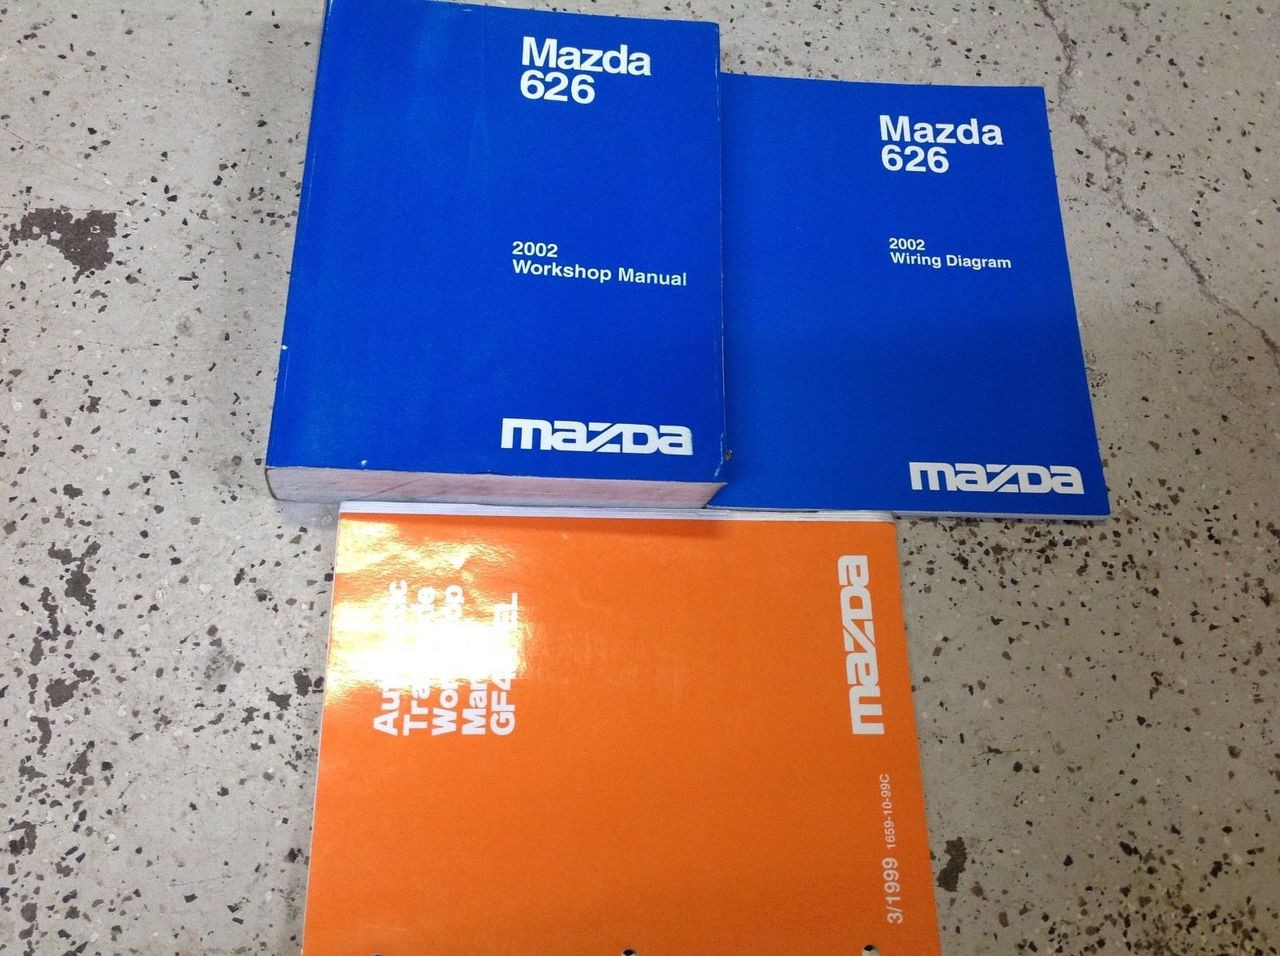 2002 Mazda 626 Service Repair Shop Workshop Manual Set W Ewd   Transaxle Bk Oem